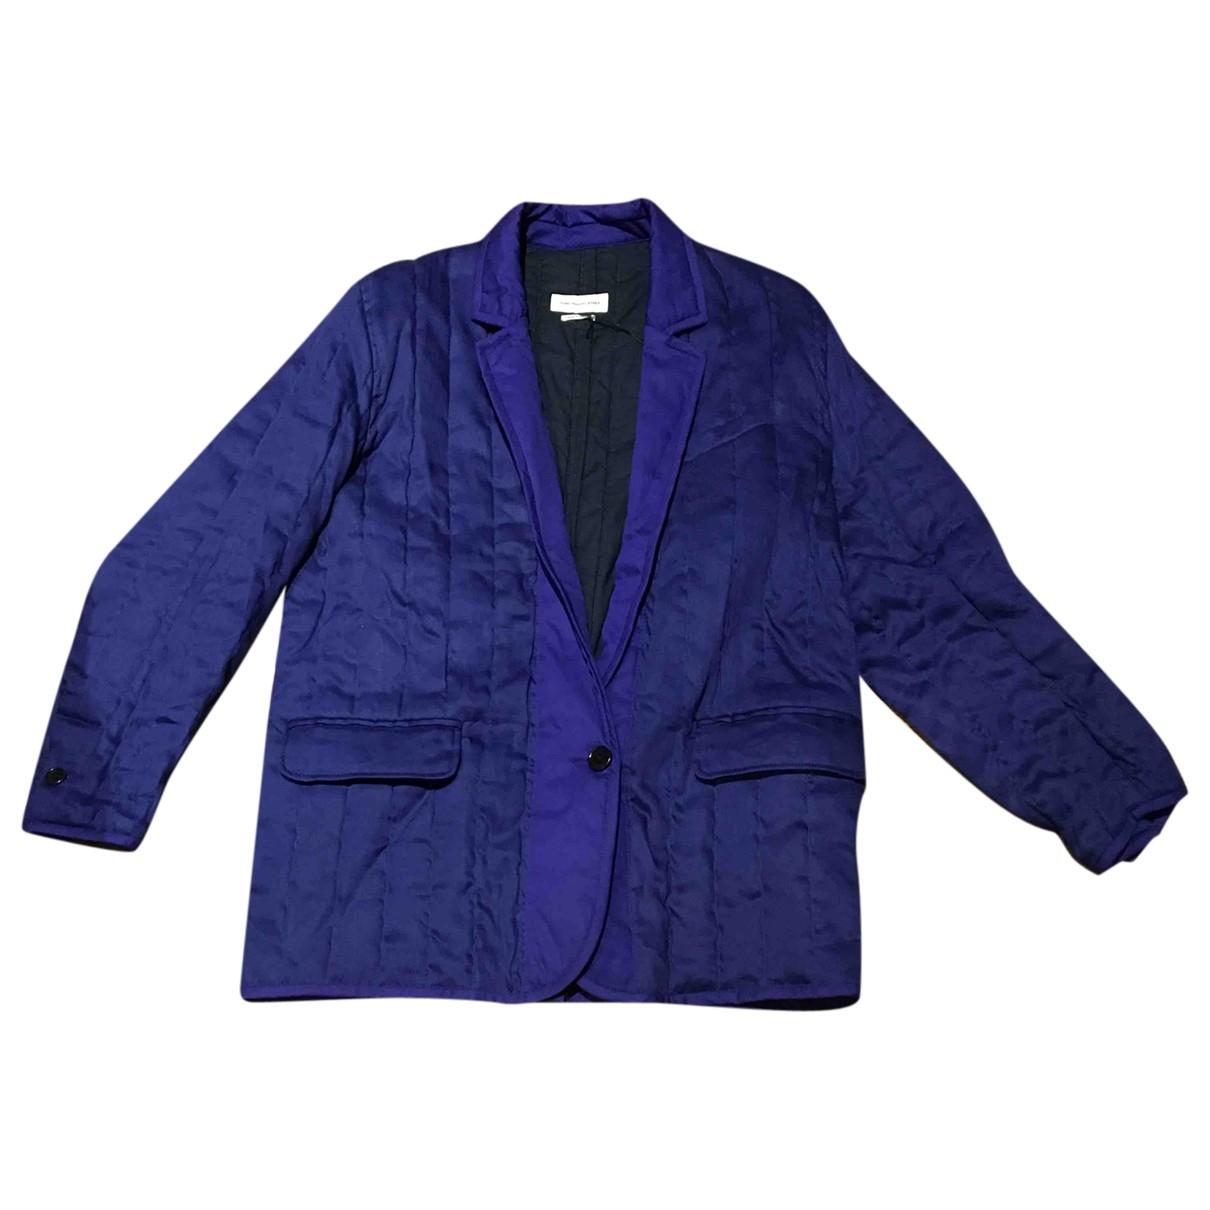 Isabel Marant Etoile \N Navy Cotton jacket for Women 36 FR